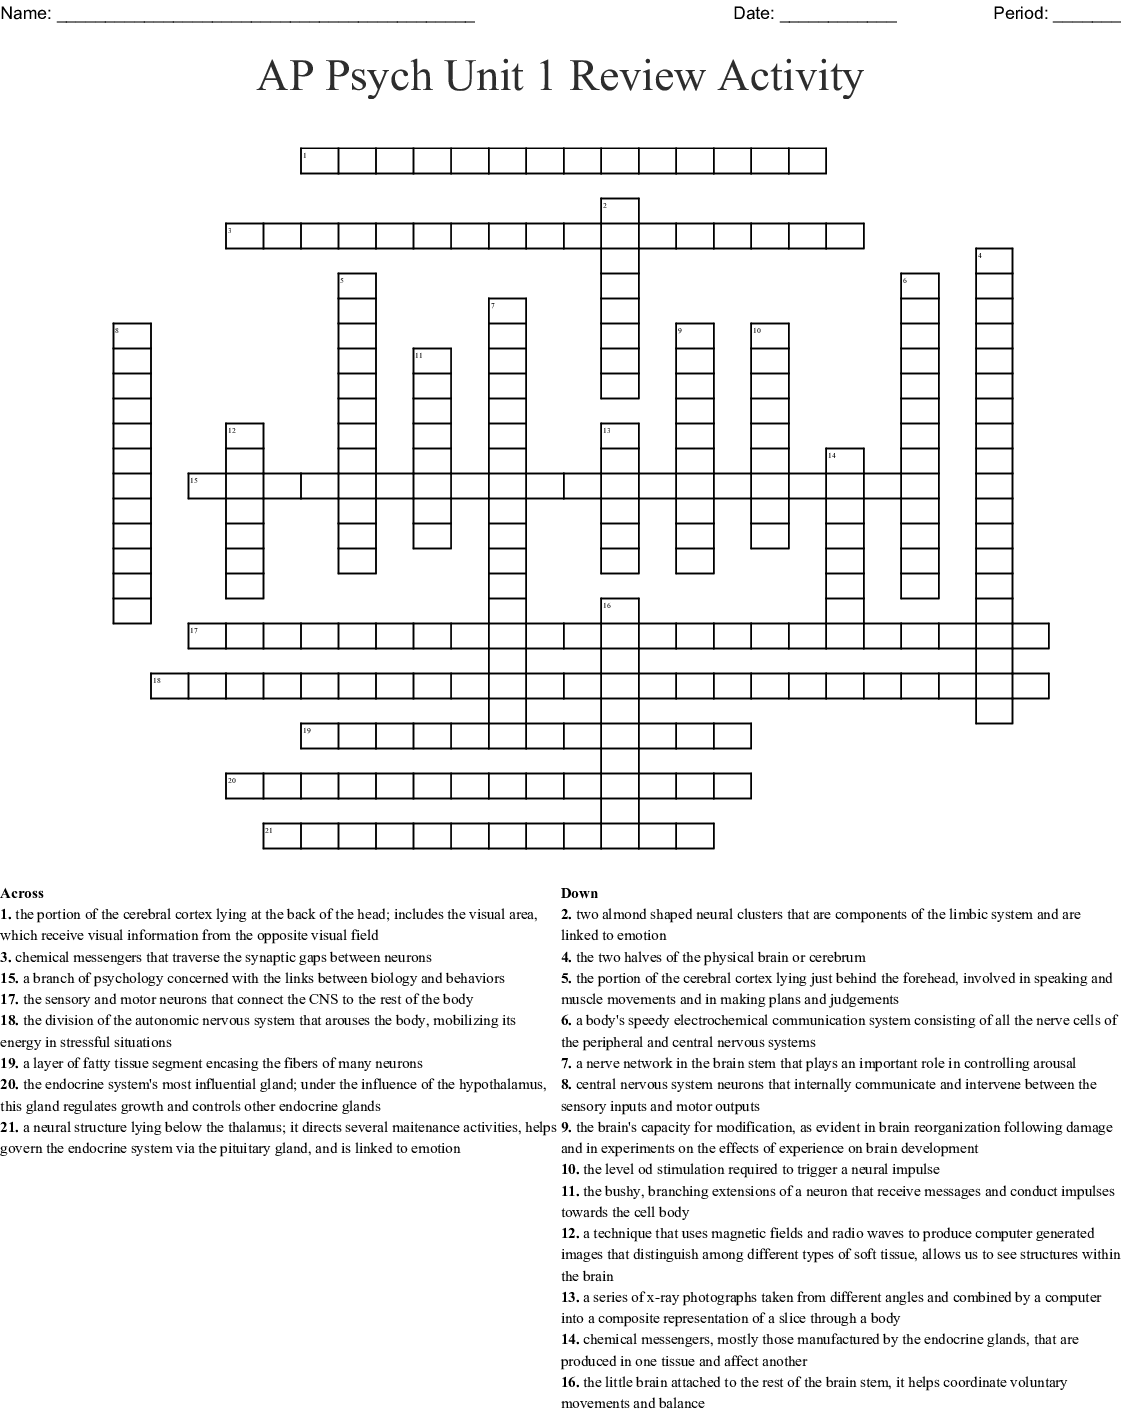 Ap Psych Unit 1 Review Activity Crossword